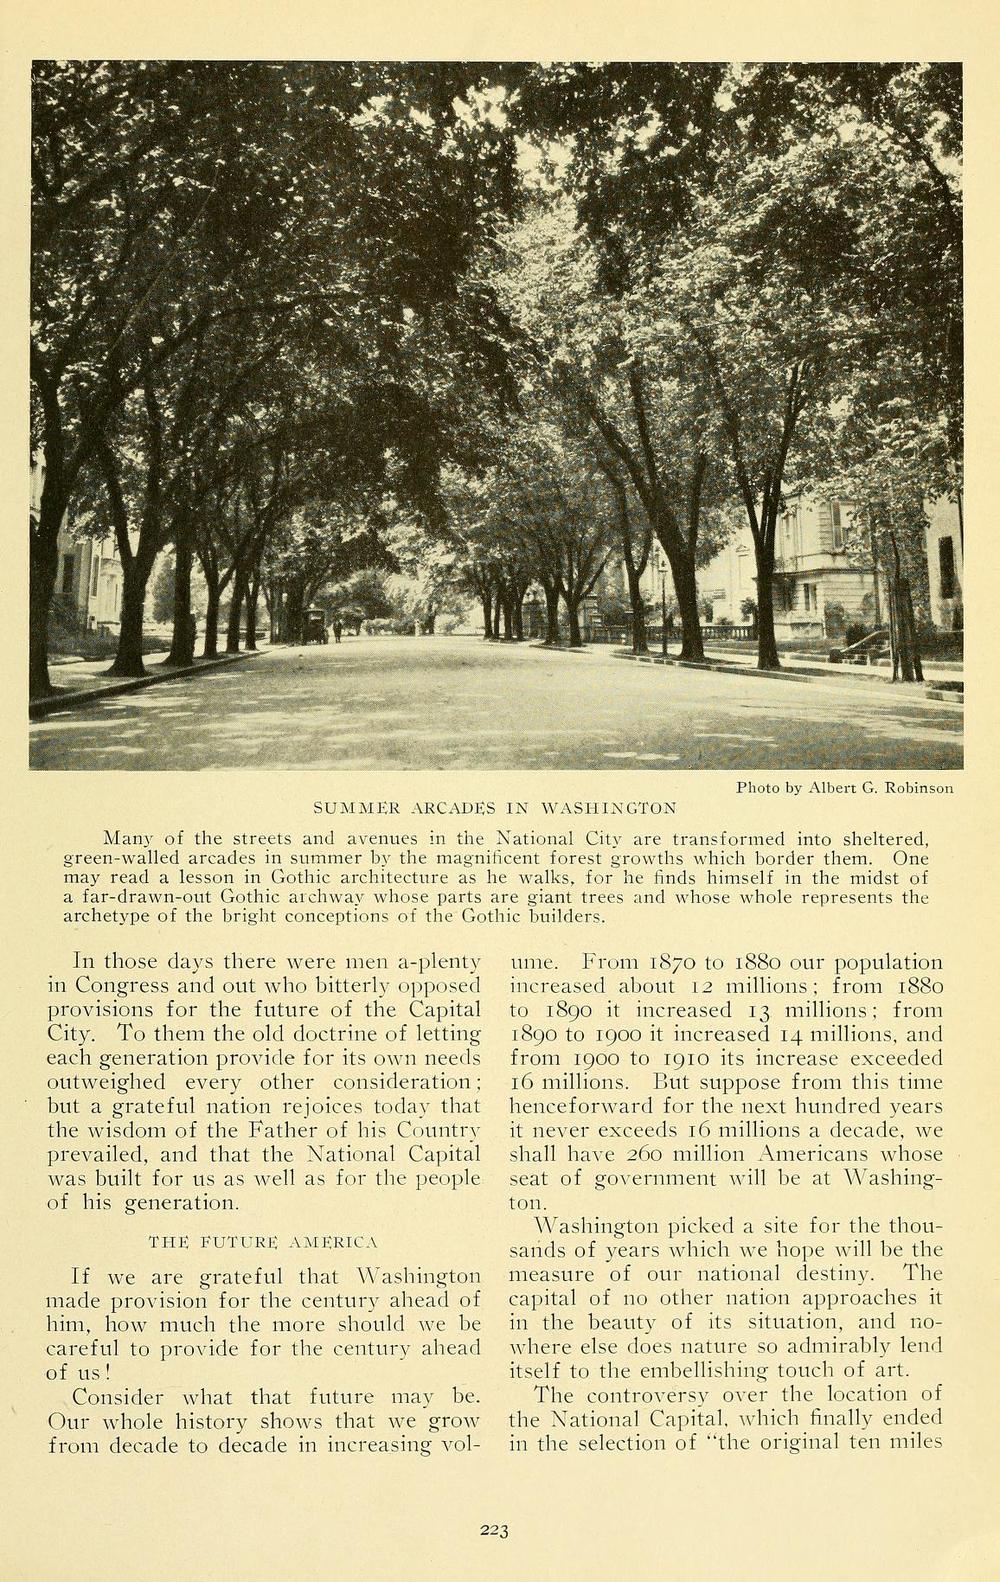 Trees in Washington, DC in 1915